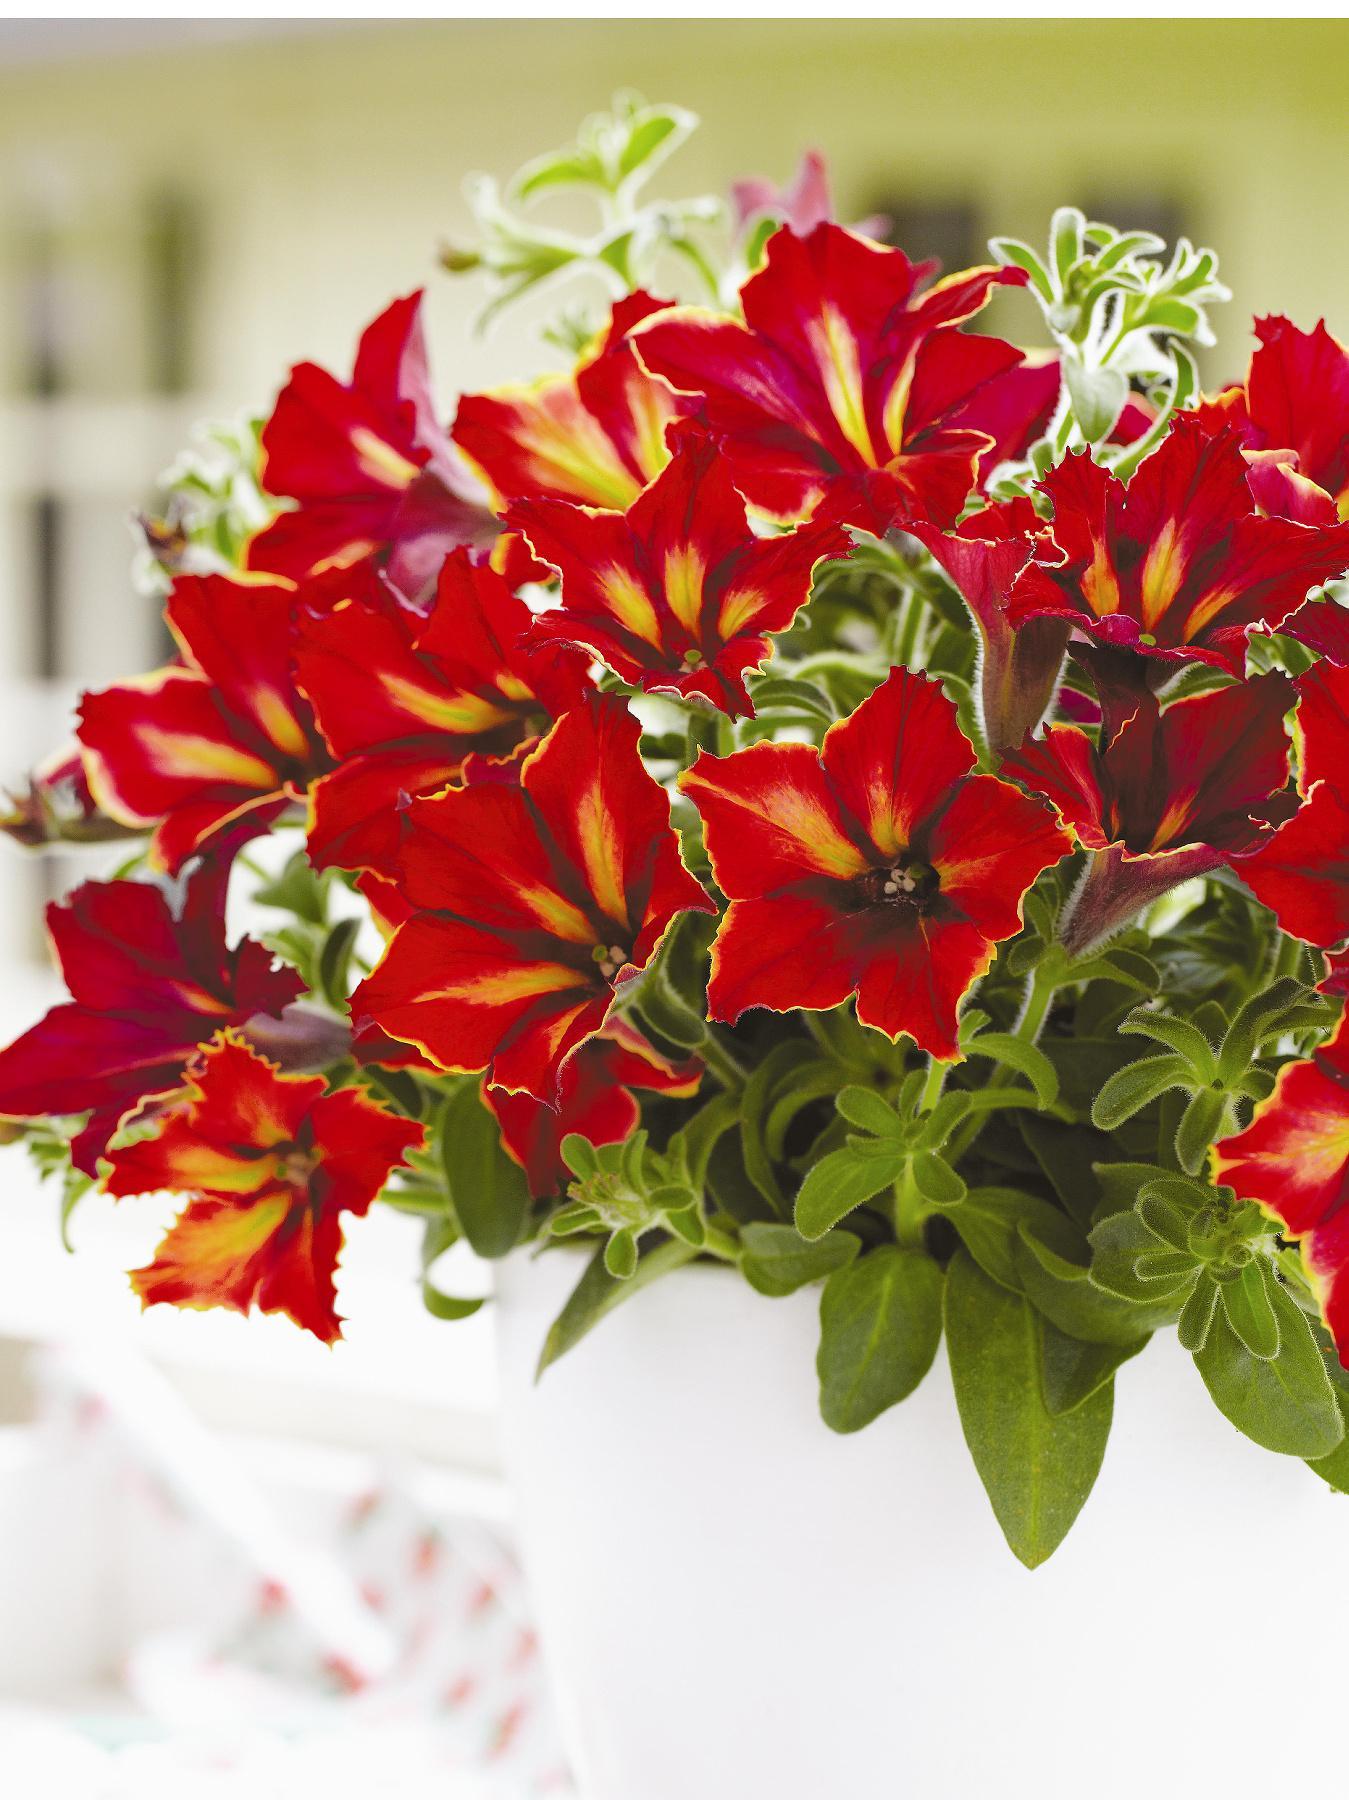 Thompson & Morgan Petunia 'Crazytunia Mandevilla' - 10 Postiplugs